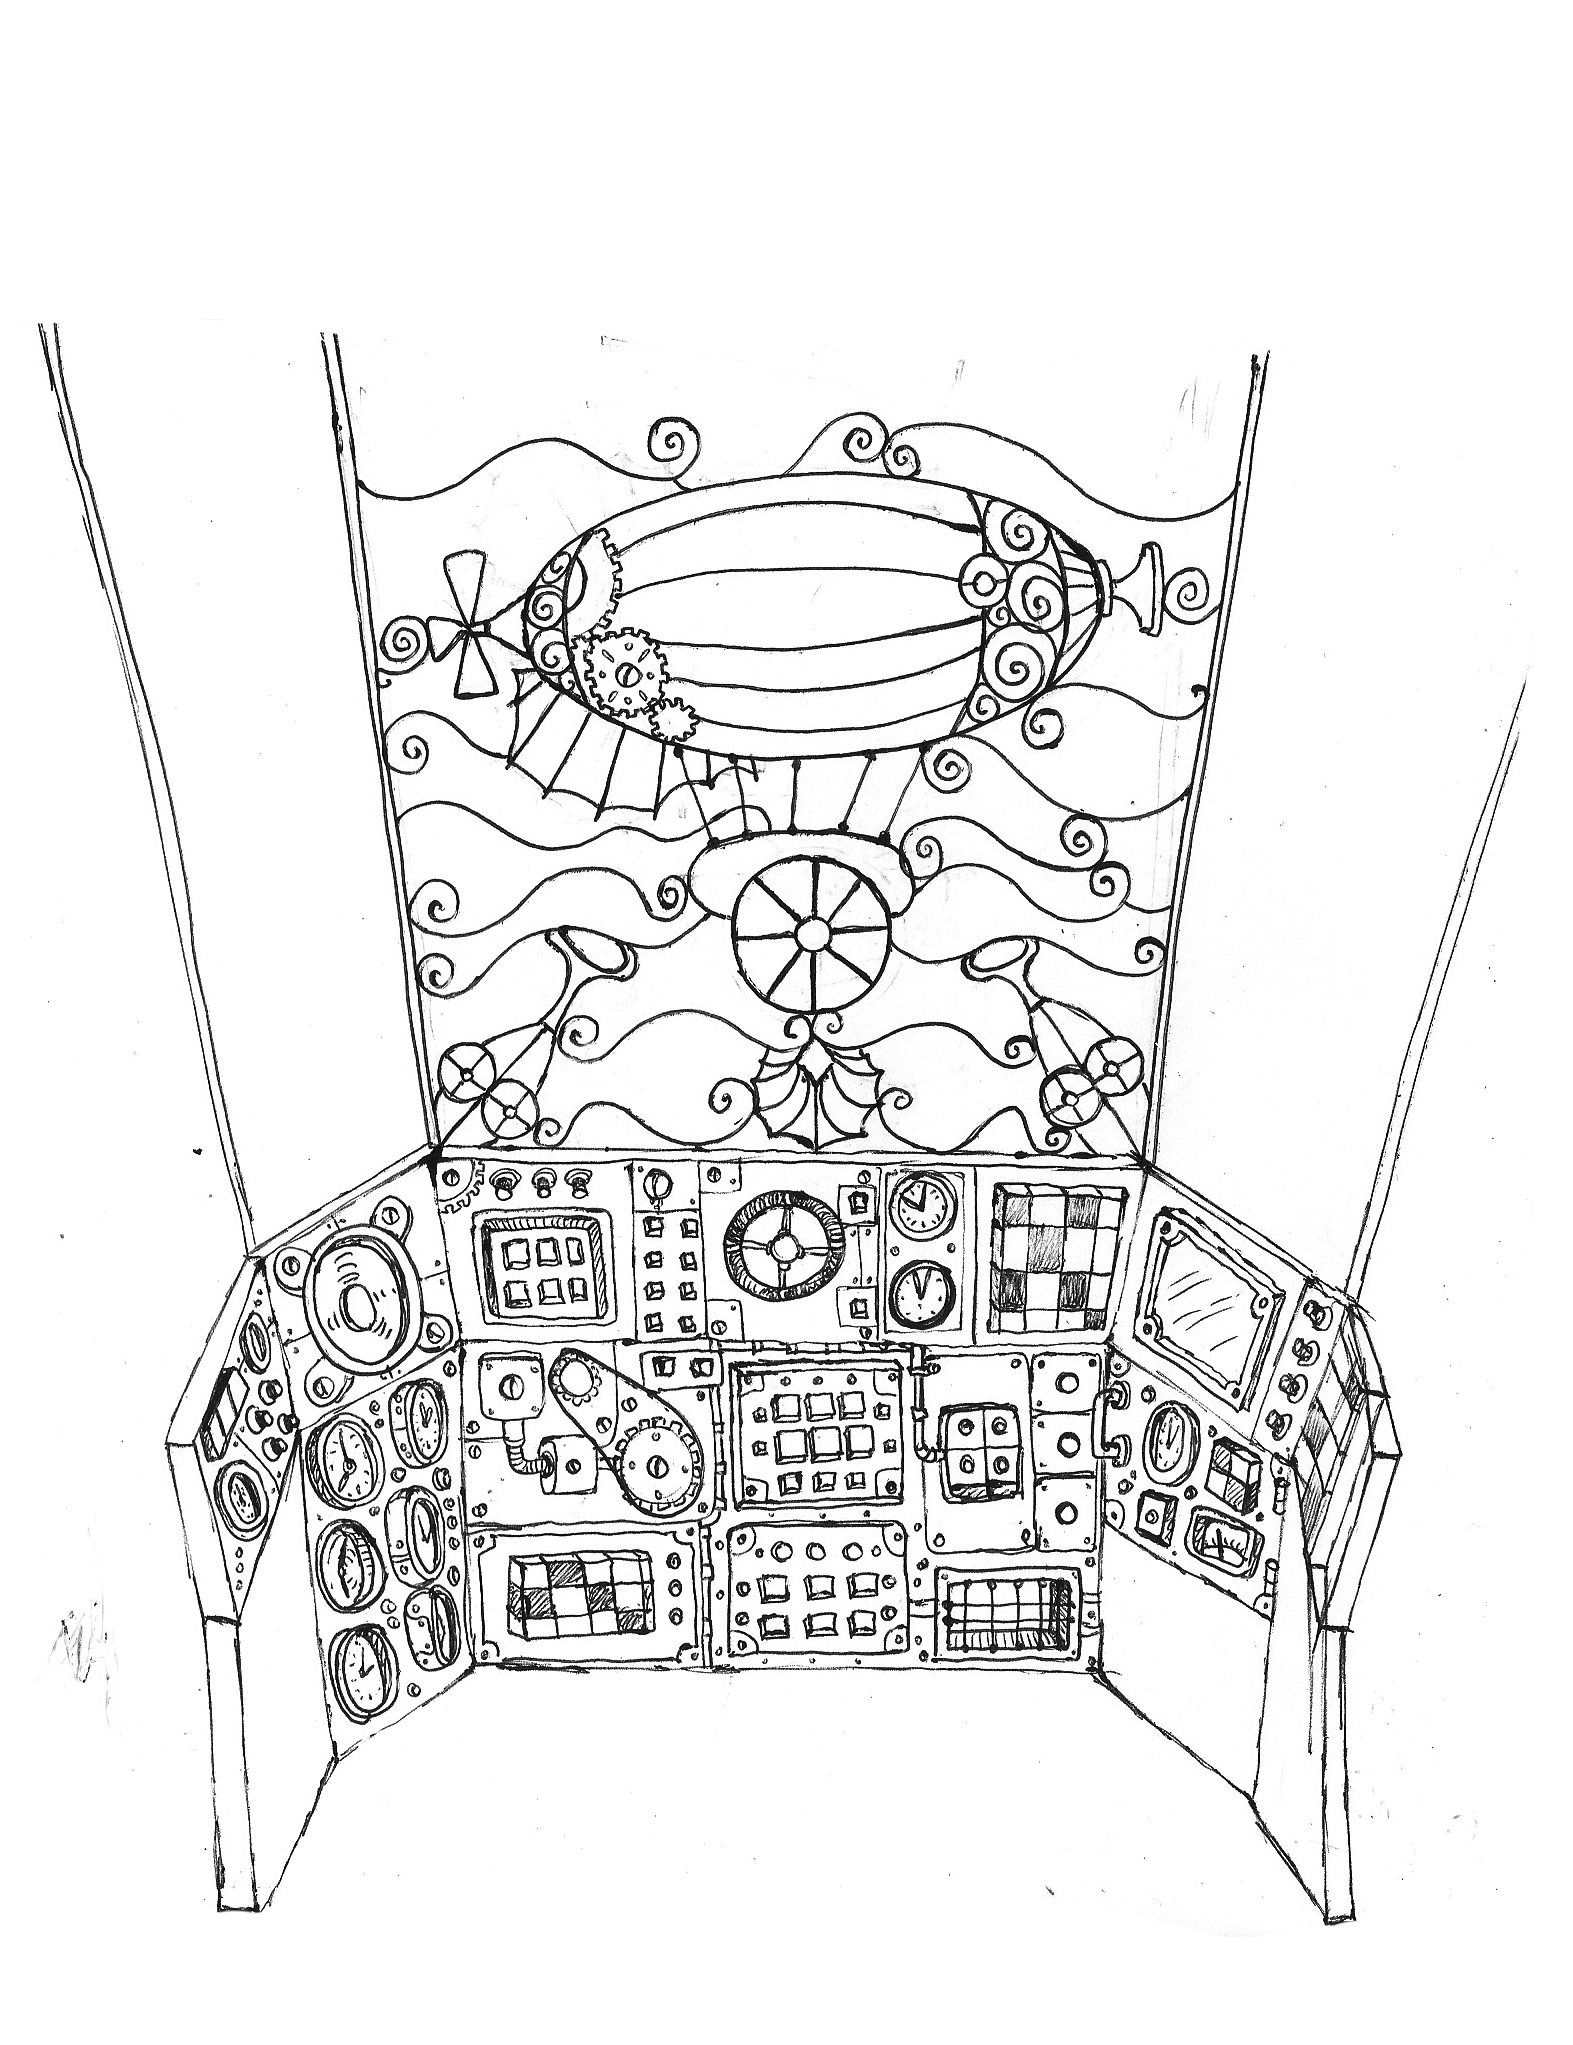 Airshipandcontrolpanel.jpg